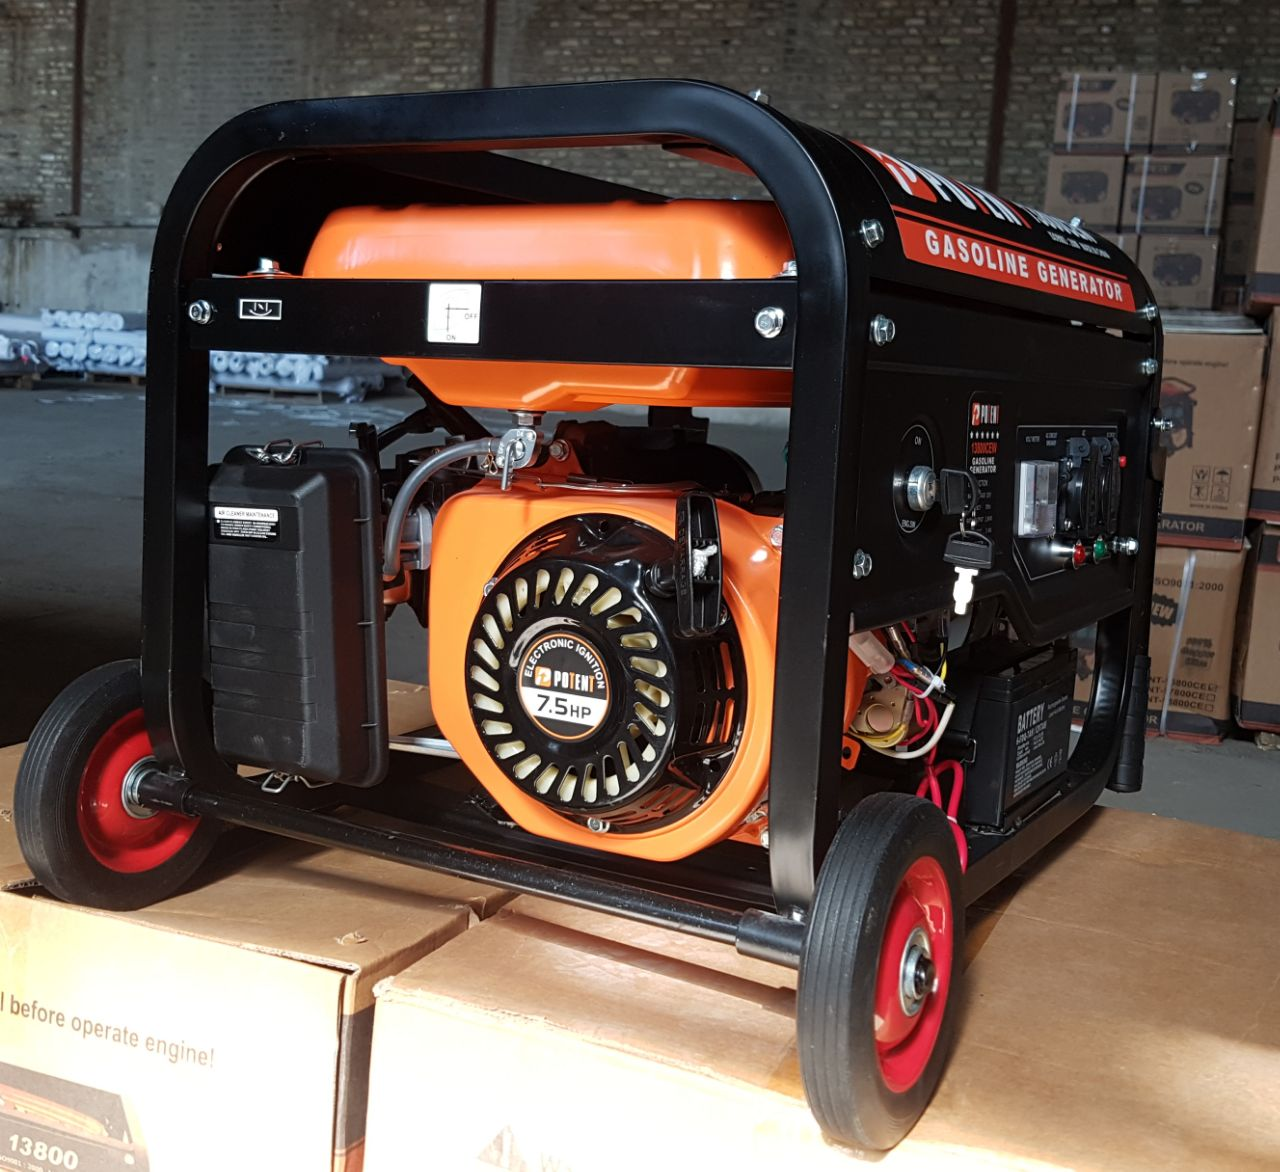 موتور برق 3کیلو وات استارتی چرخدار سون